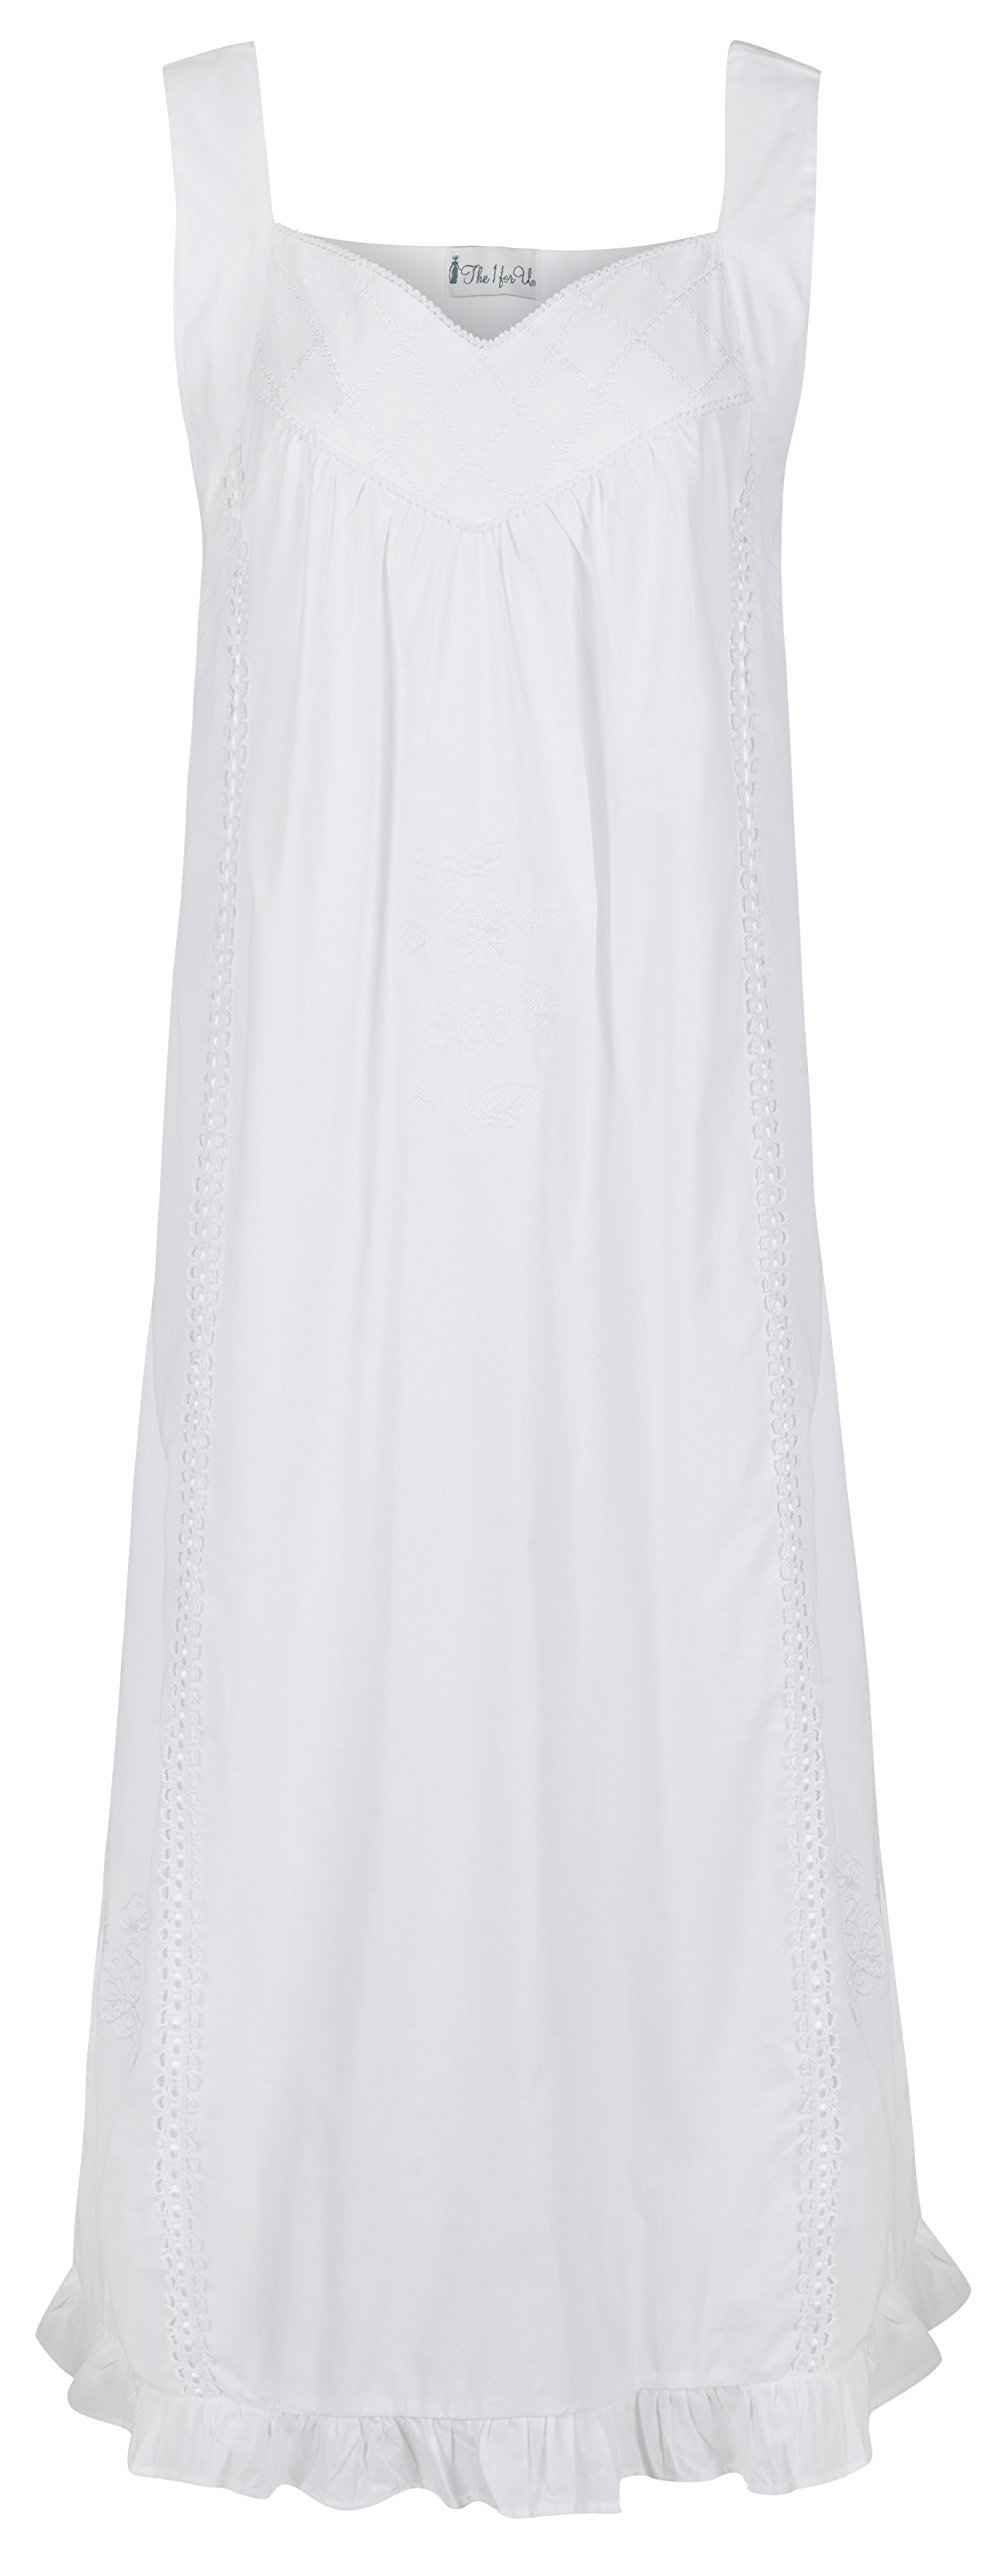 The 1 for U 100% Cotton Nightgown Vintage Design - Nancy (XL)